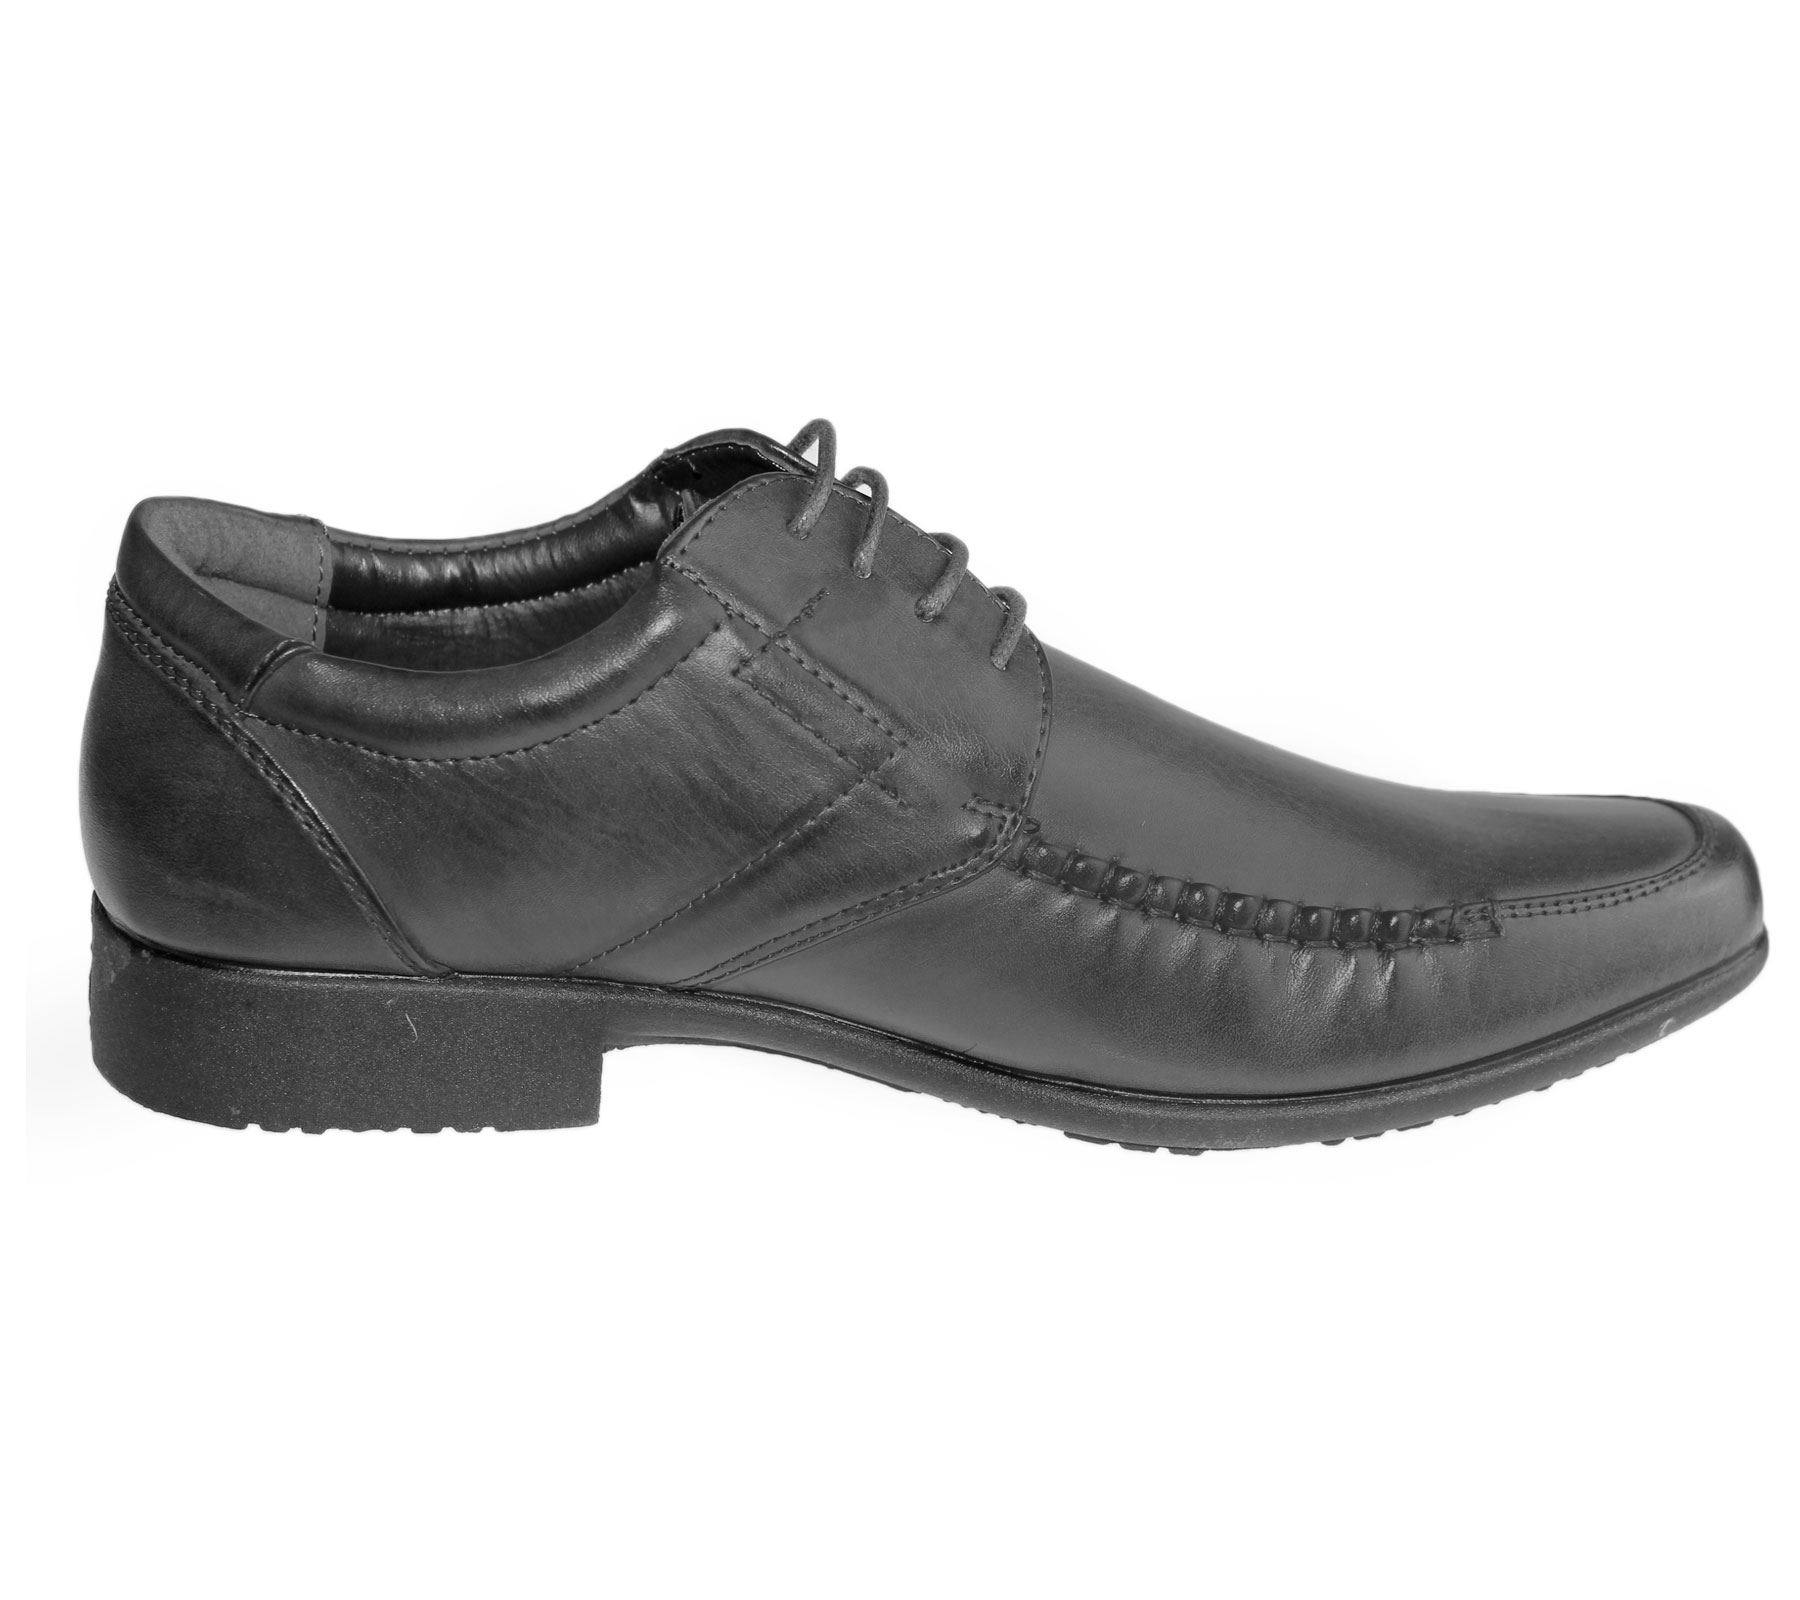 Para Hombre Oficina Zapatos Smart Boda Italiana trabajo Casual Formal Fiesta Zapatos Escolares